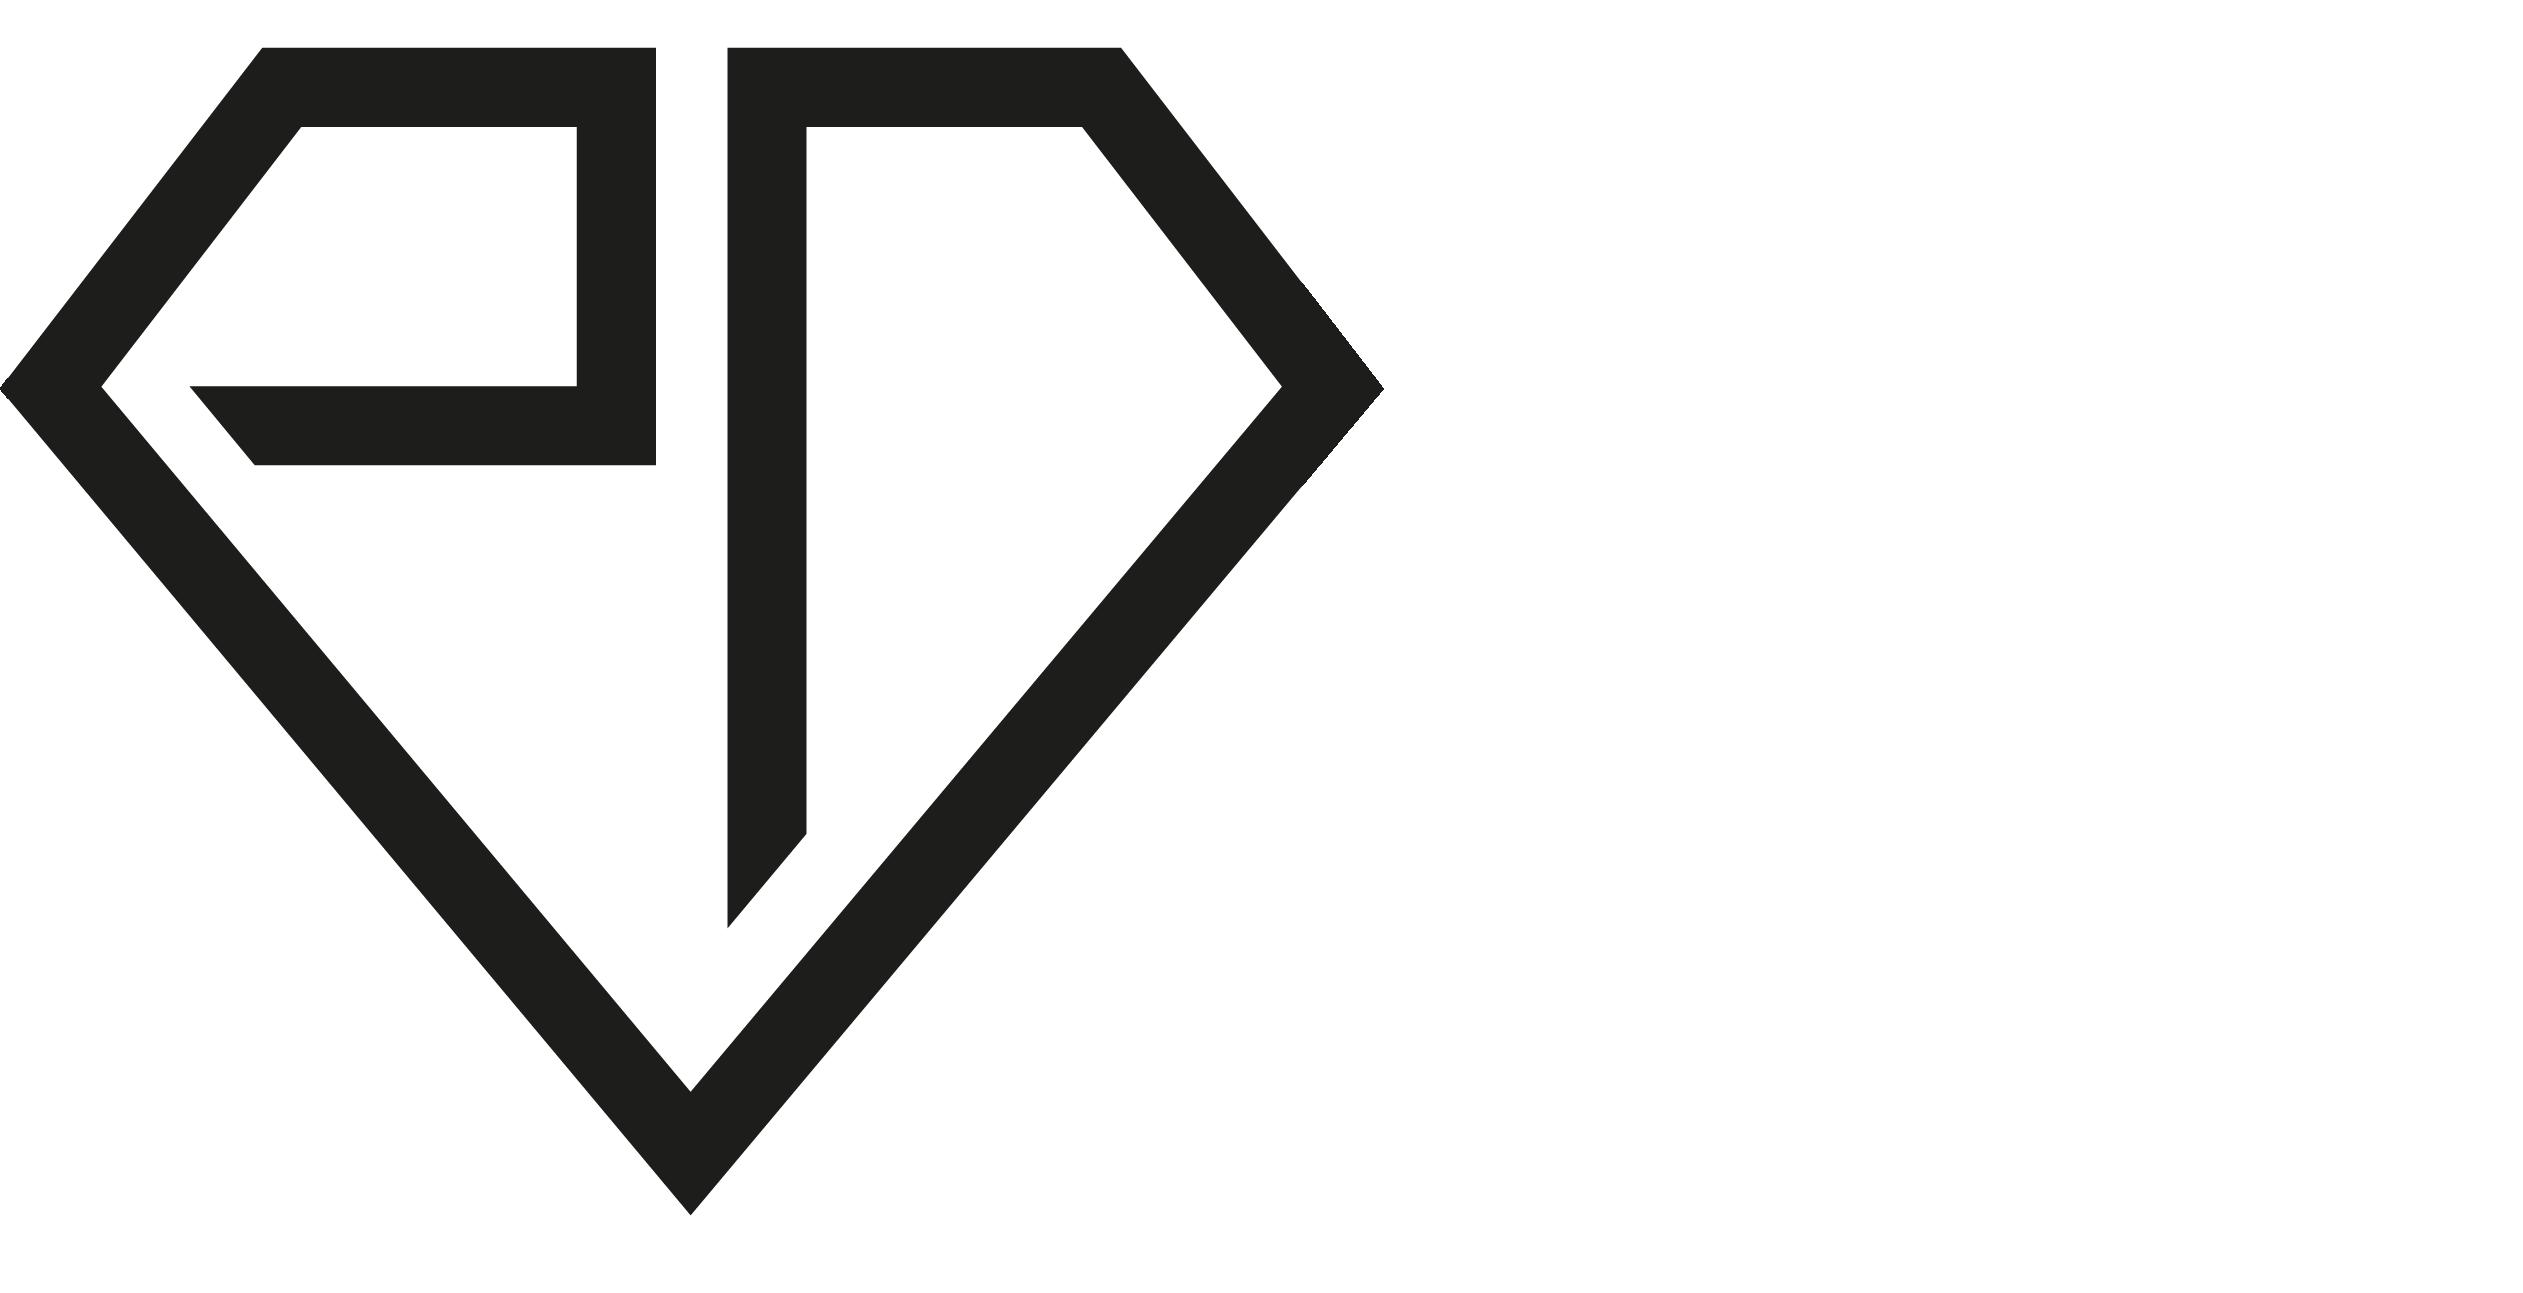 POSHH Design